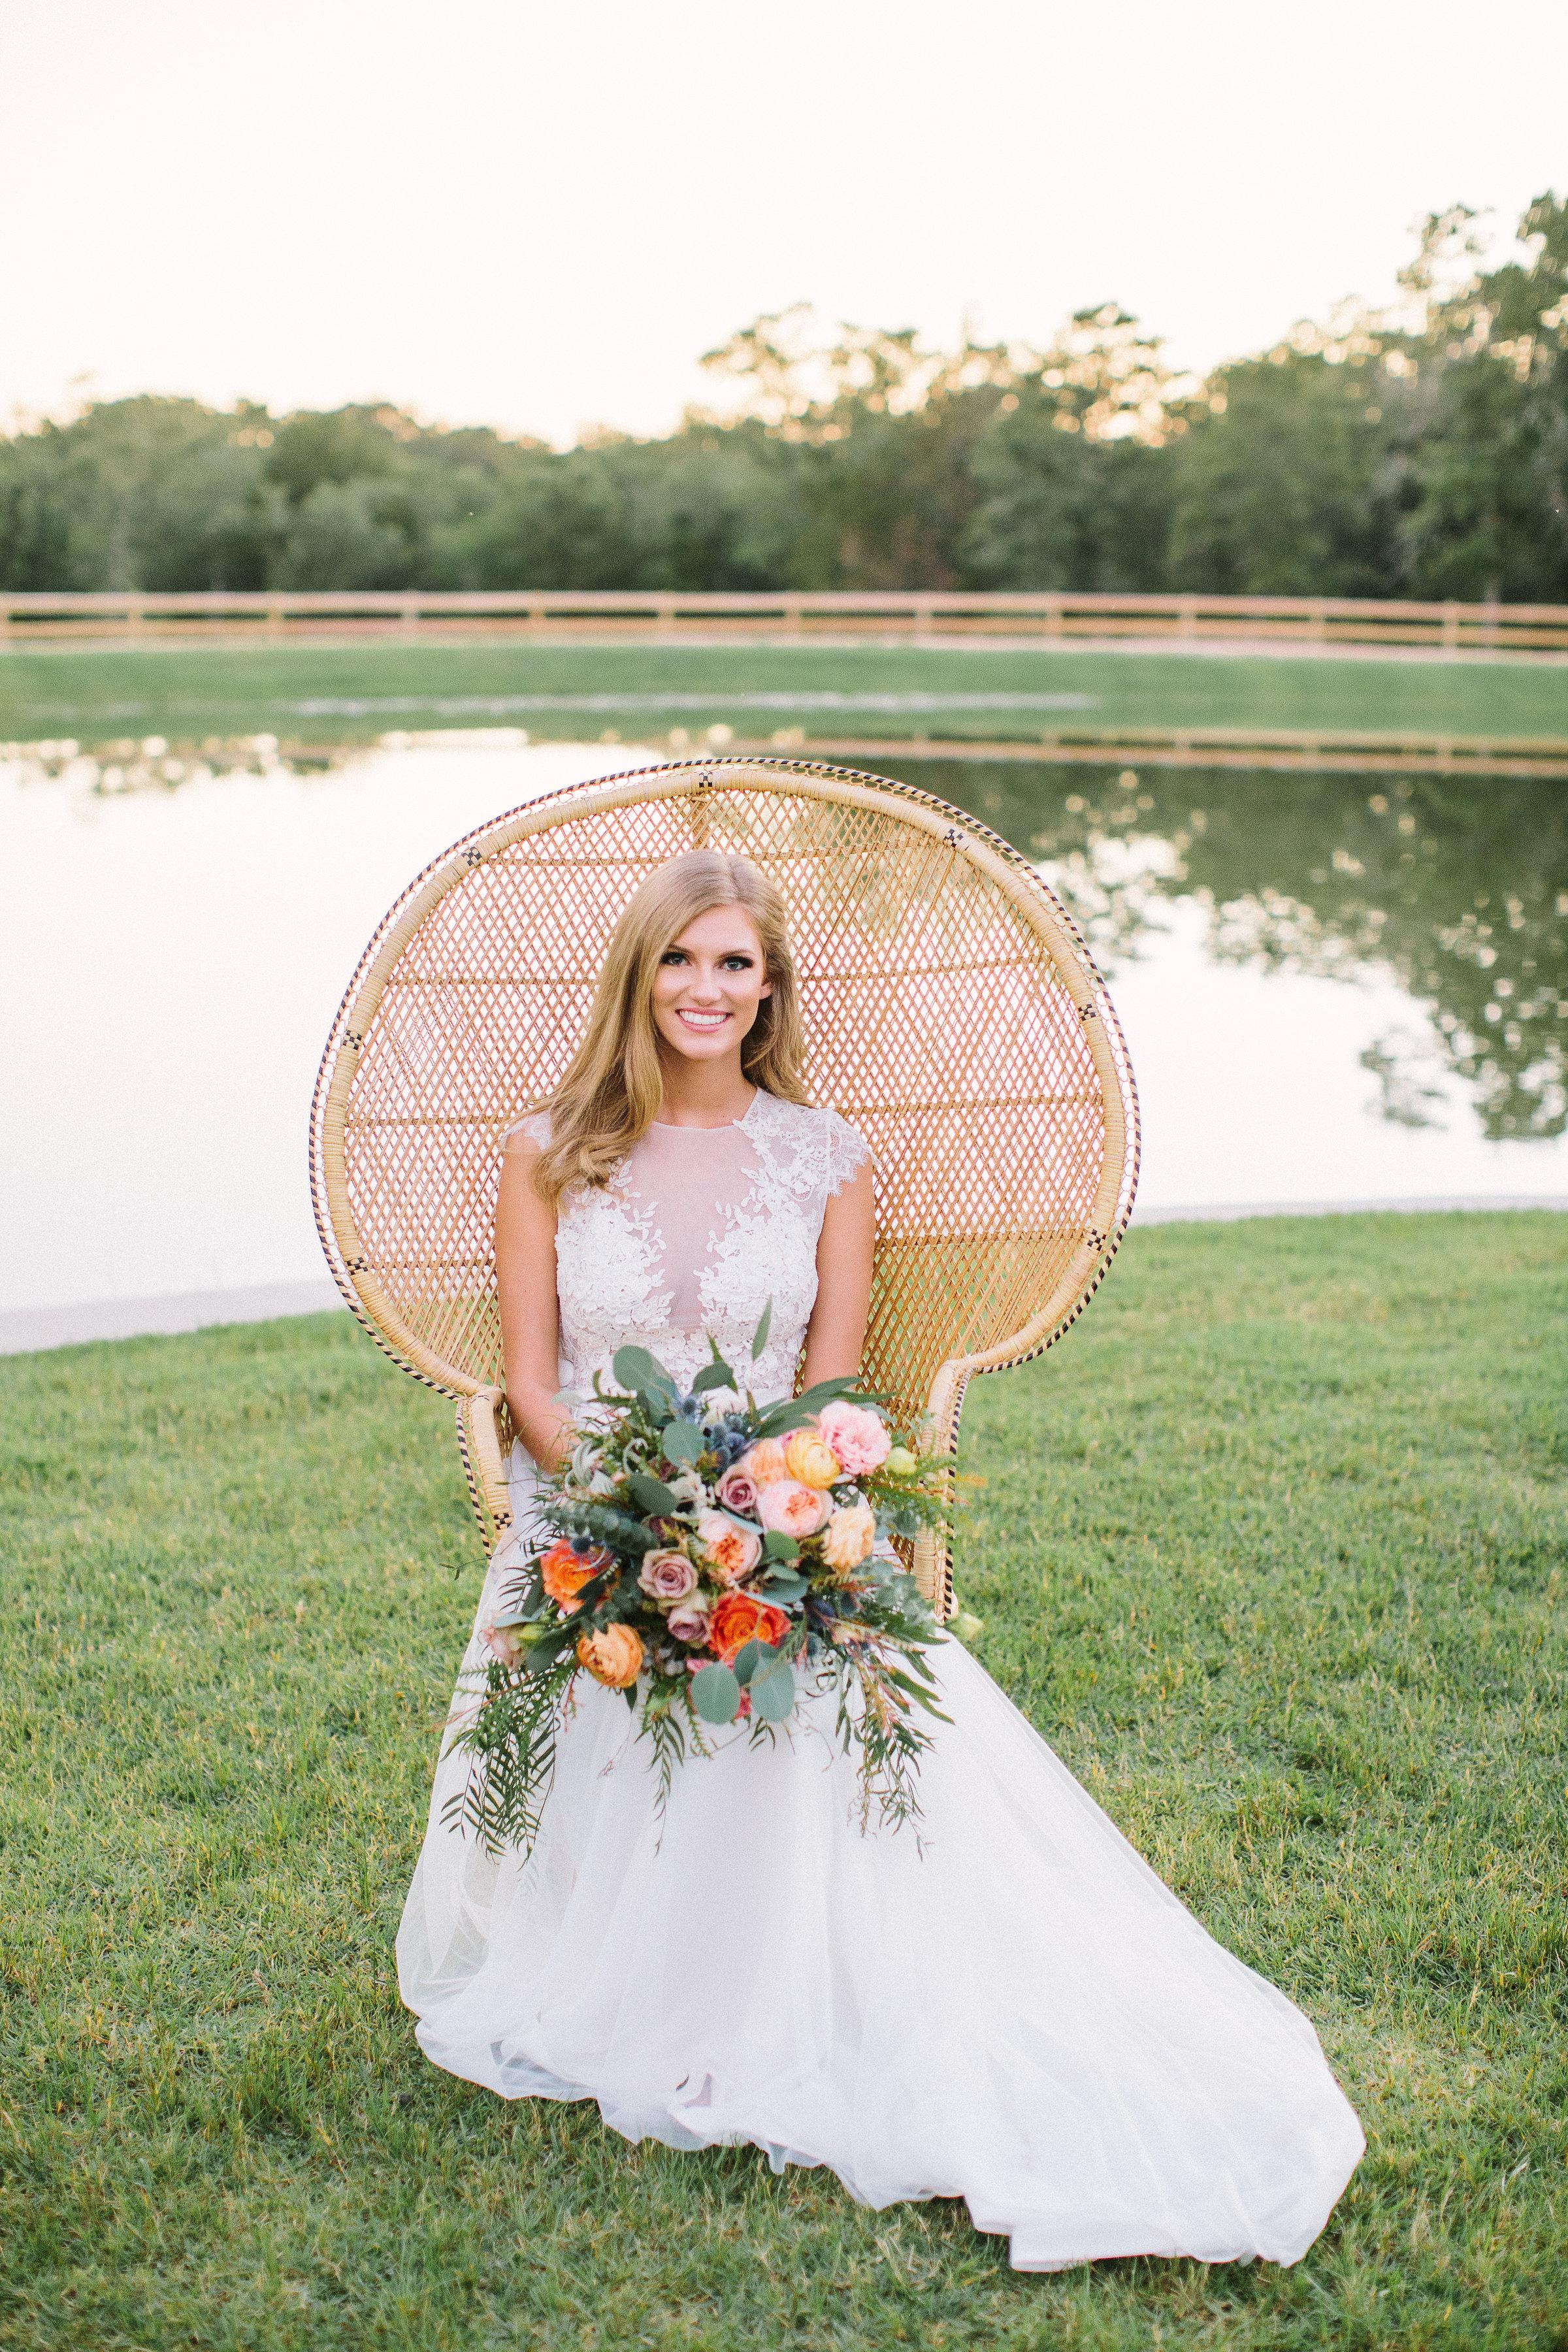 Ellen-Ashton-Photography-Peach-Creek-Ranch-Weddings-Wed-and-Prosper398